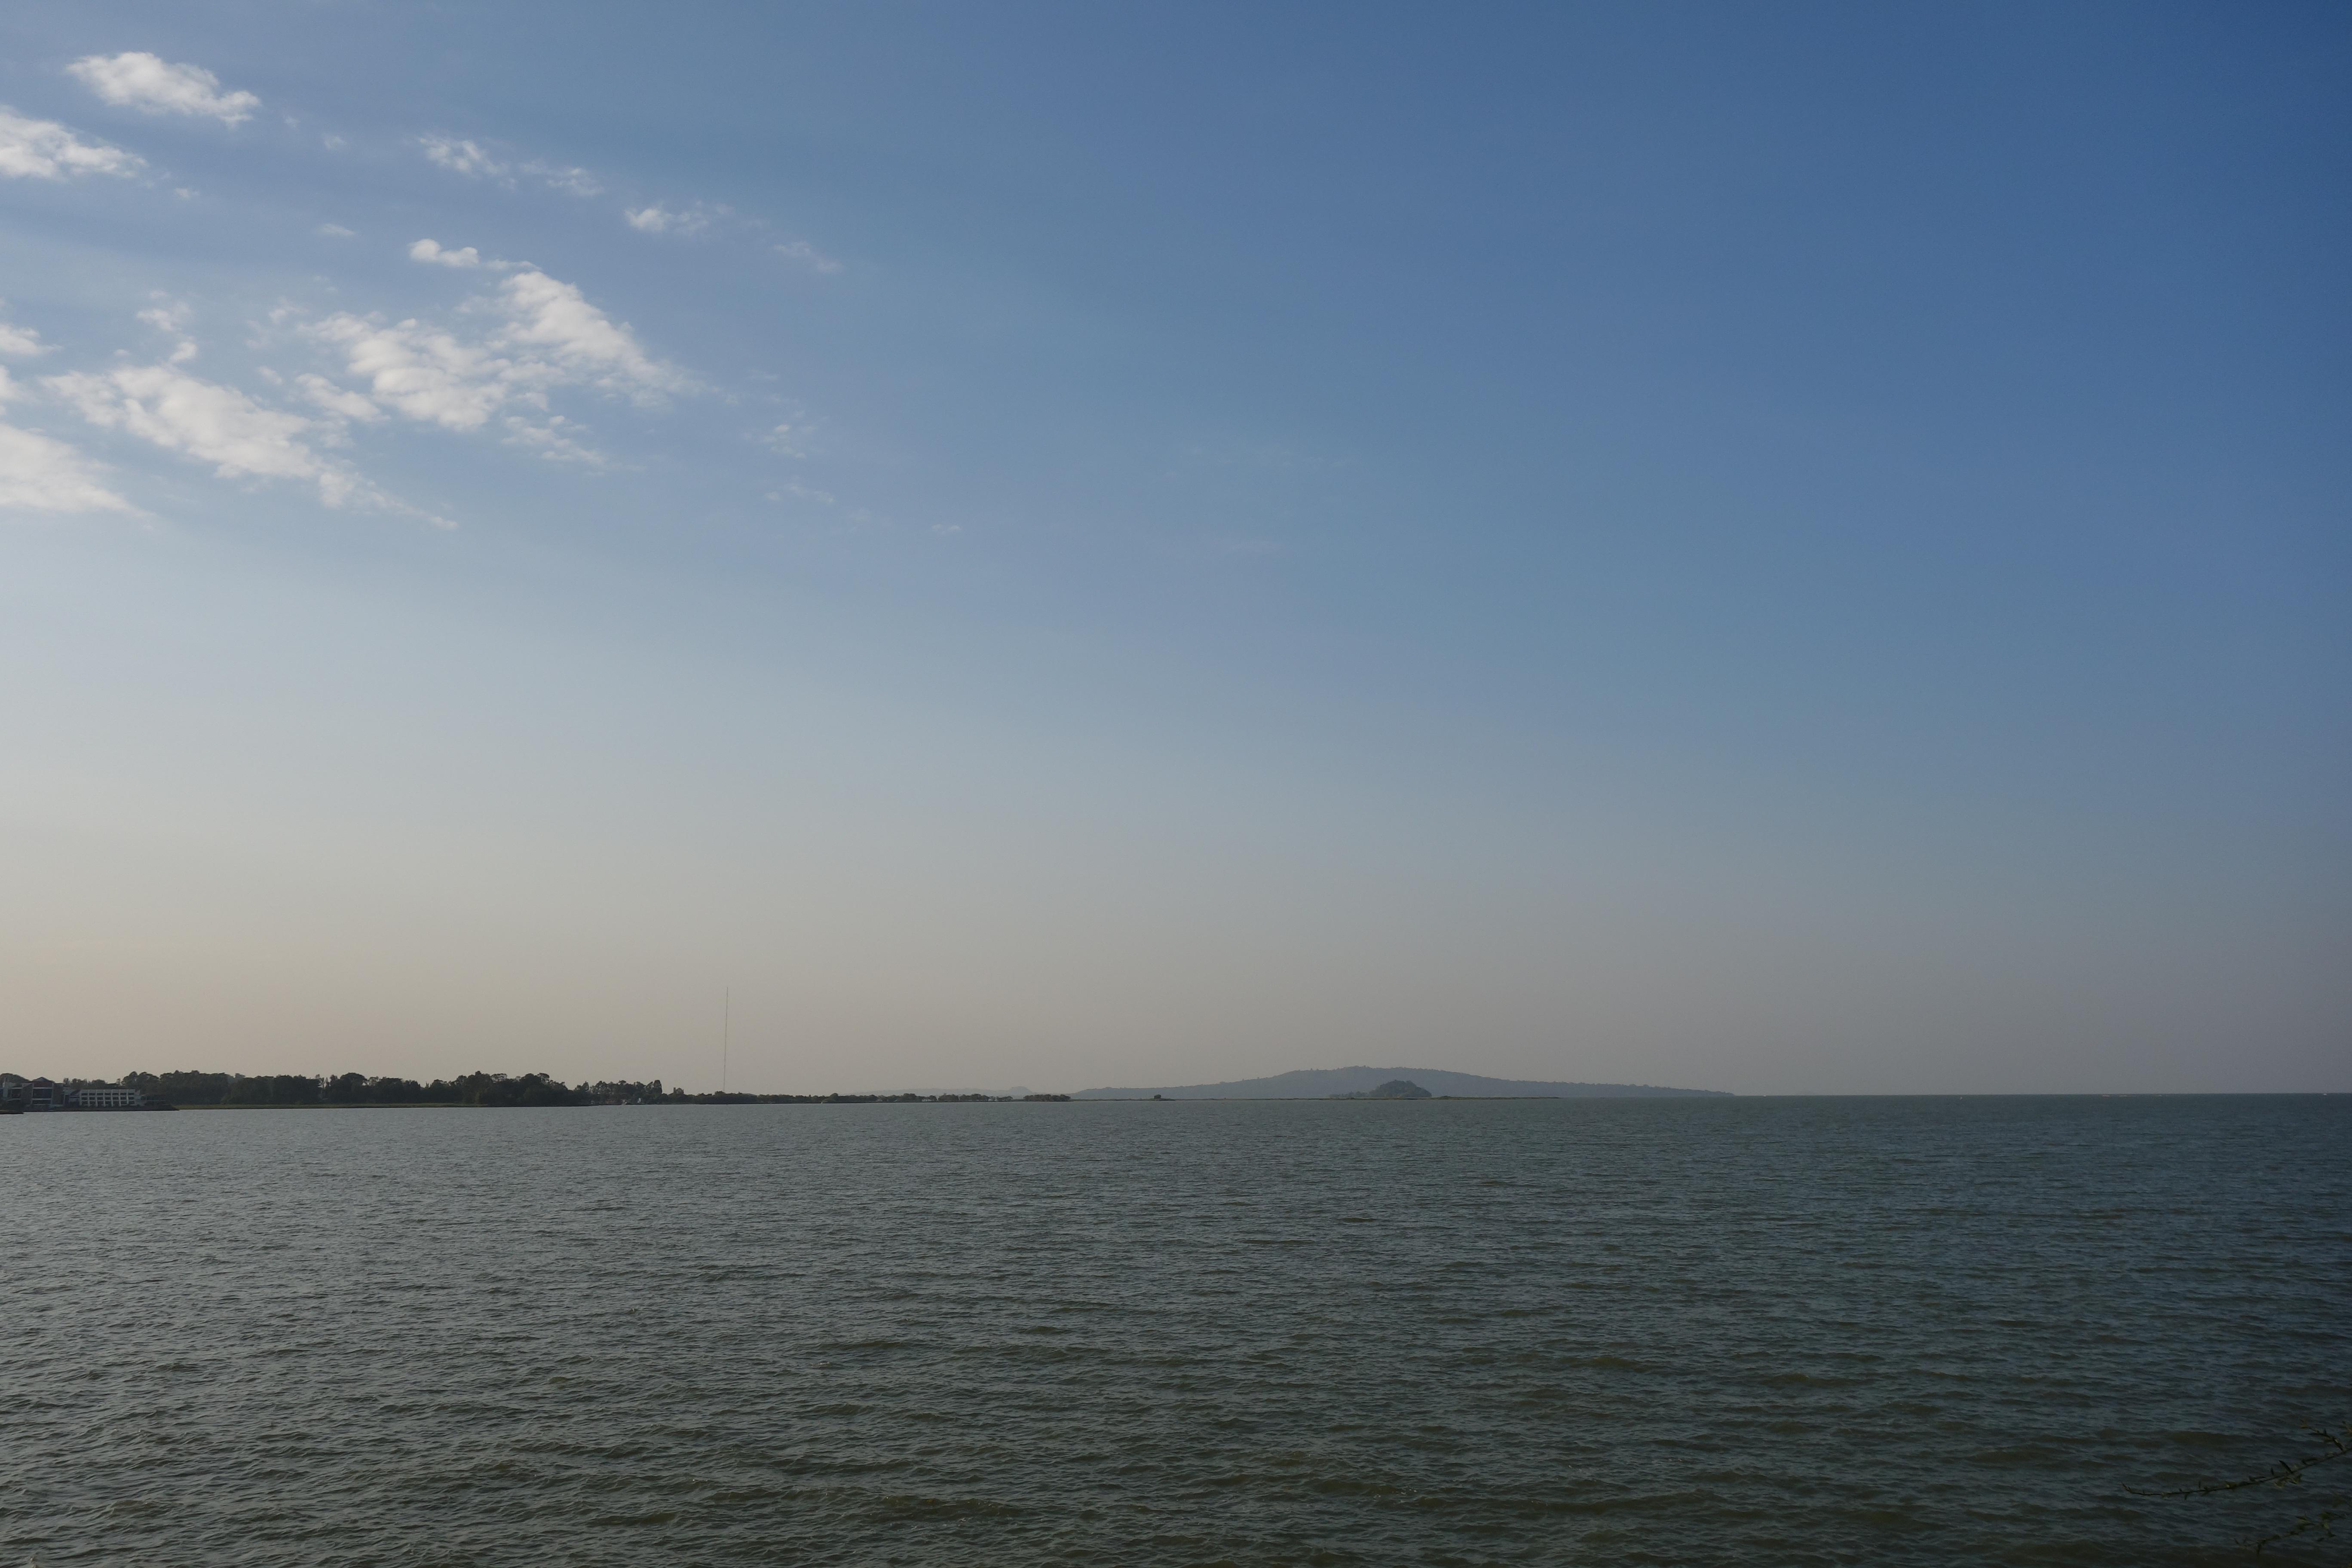 Lake Tana is enormous...